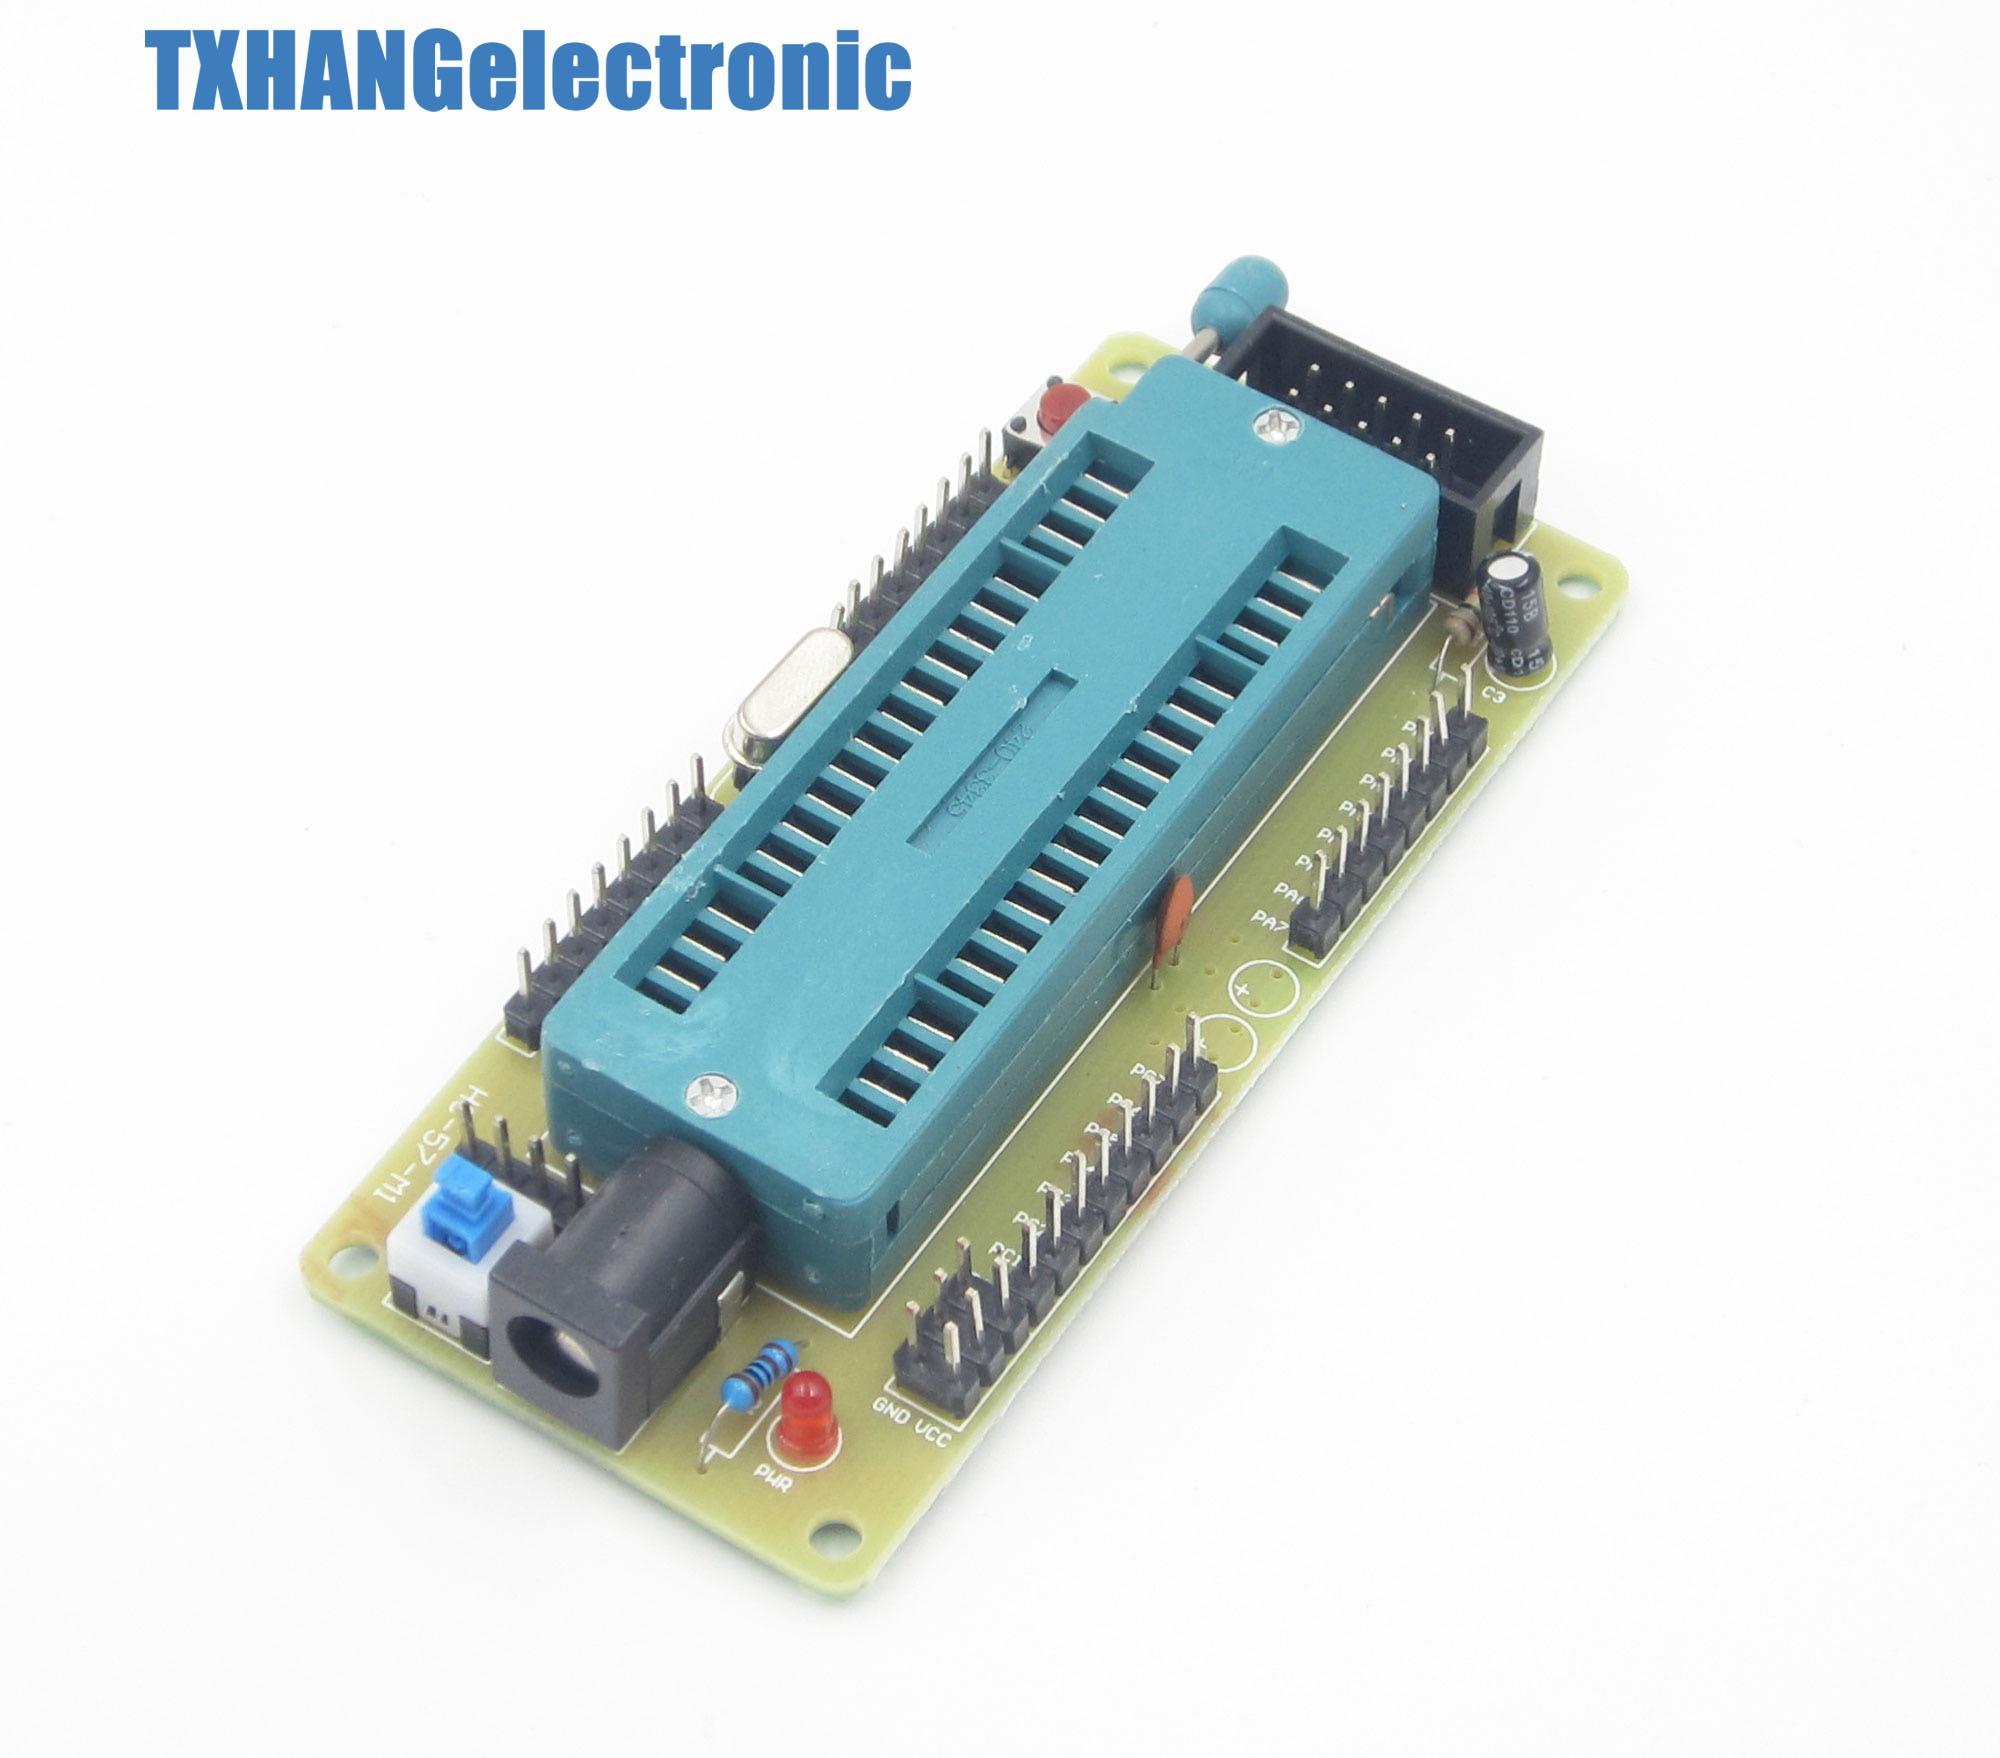 ATmega32 ISP ATMEGA16 System Board AVR Minimum System Development Board module